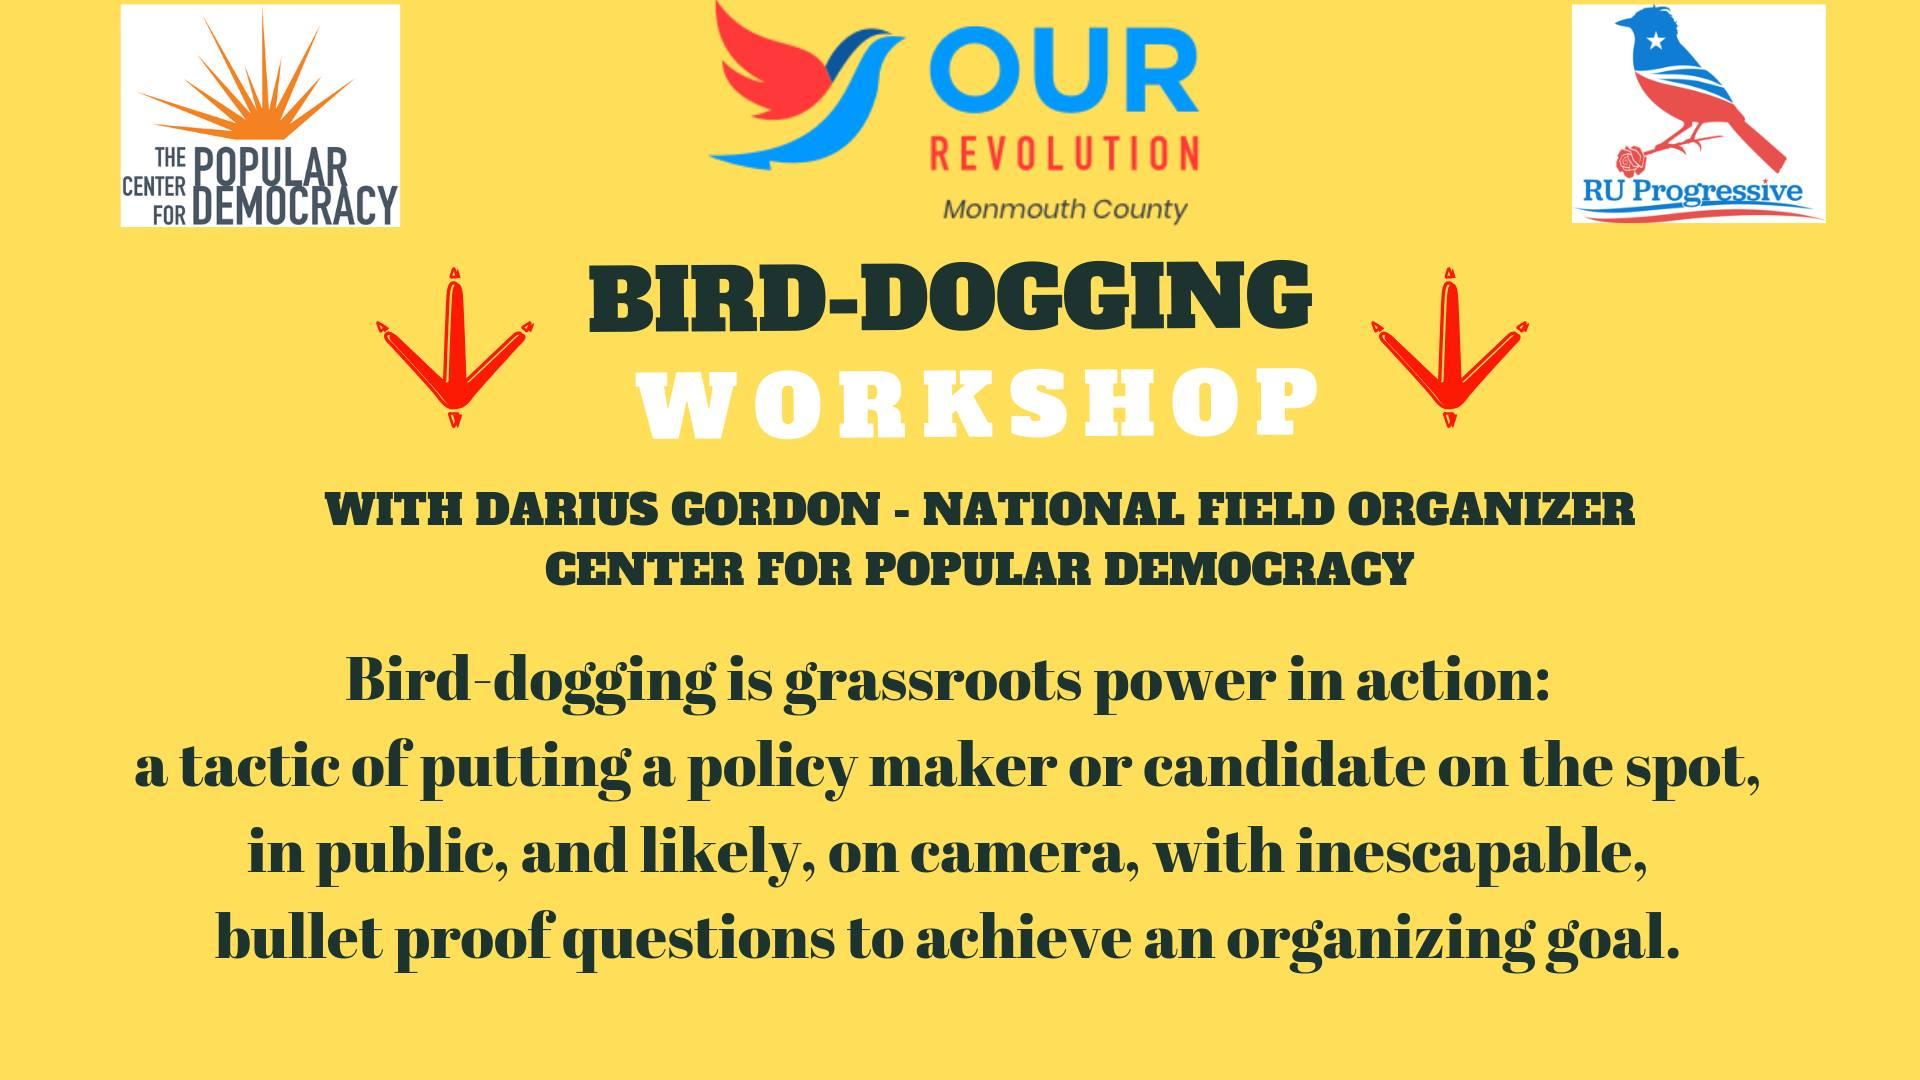 bird-dogging.jpg